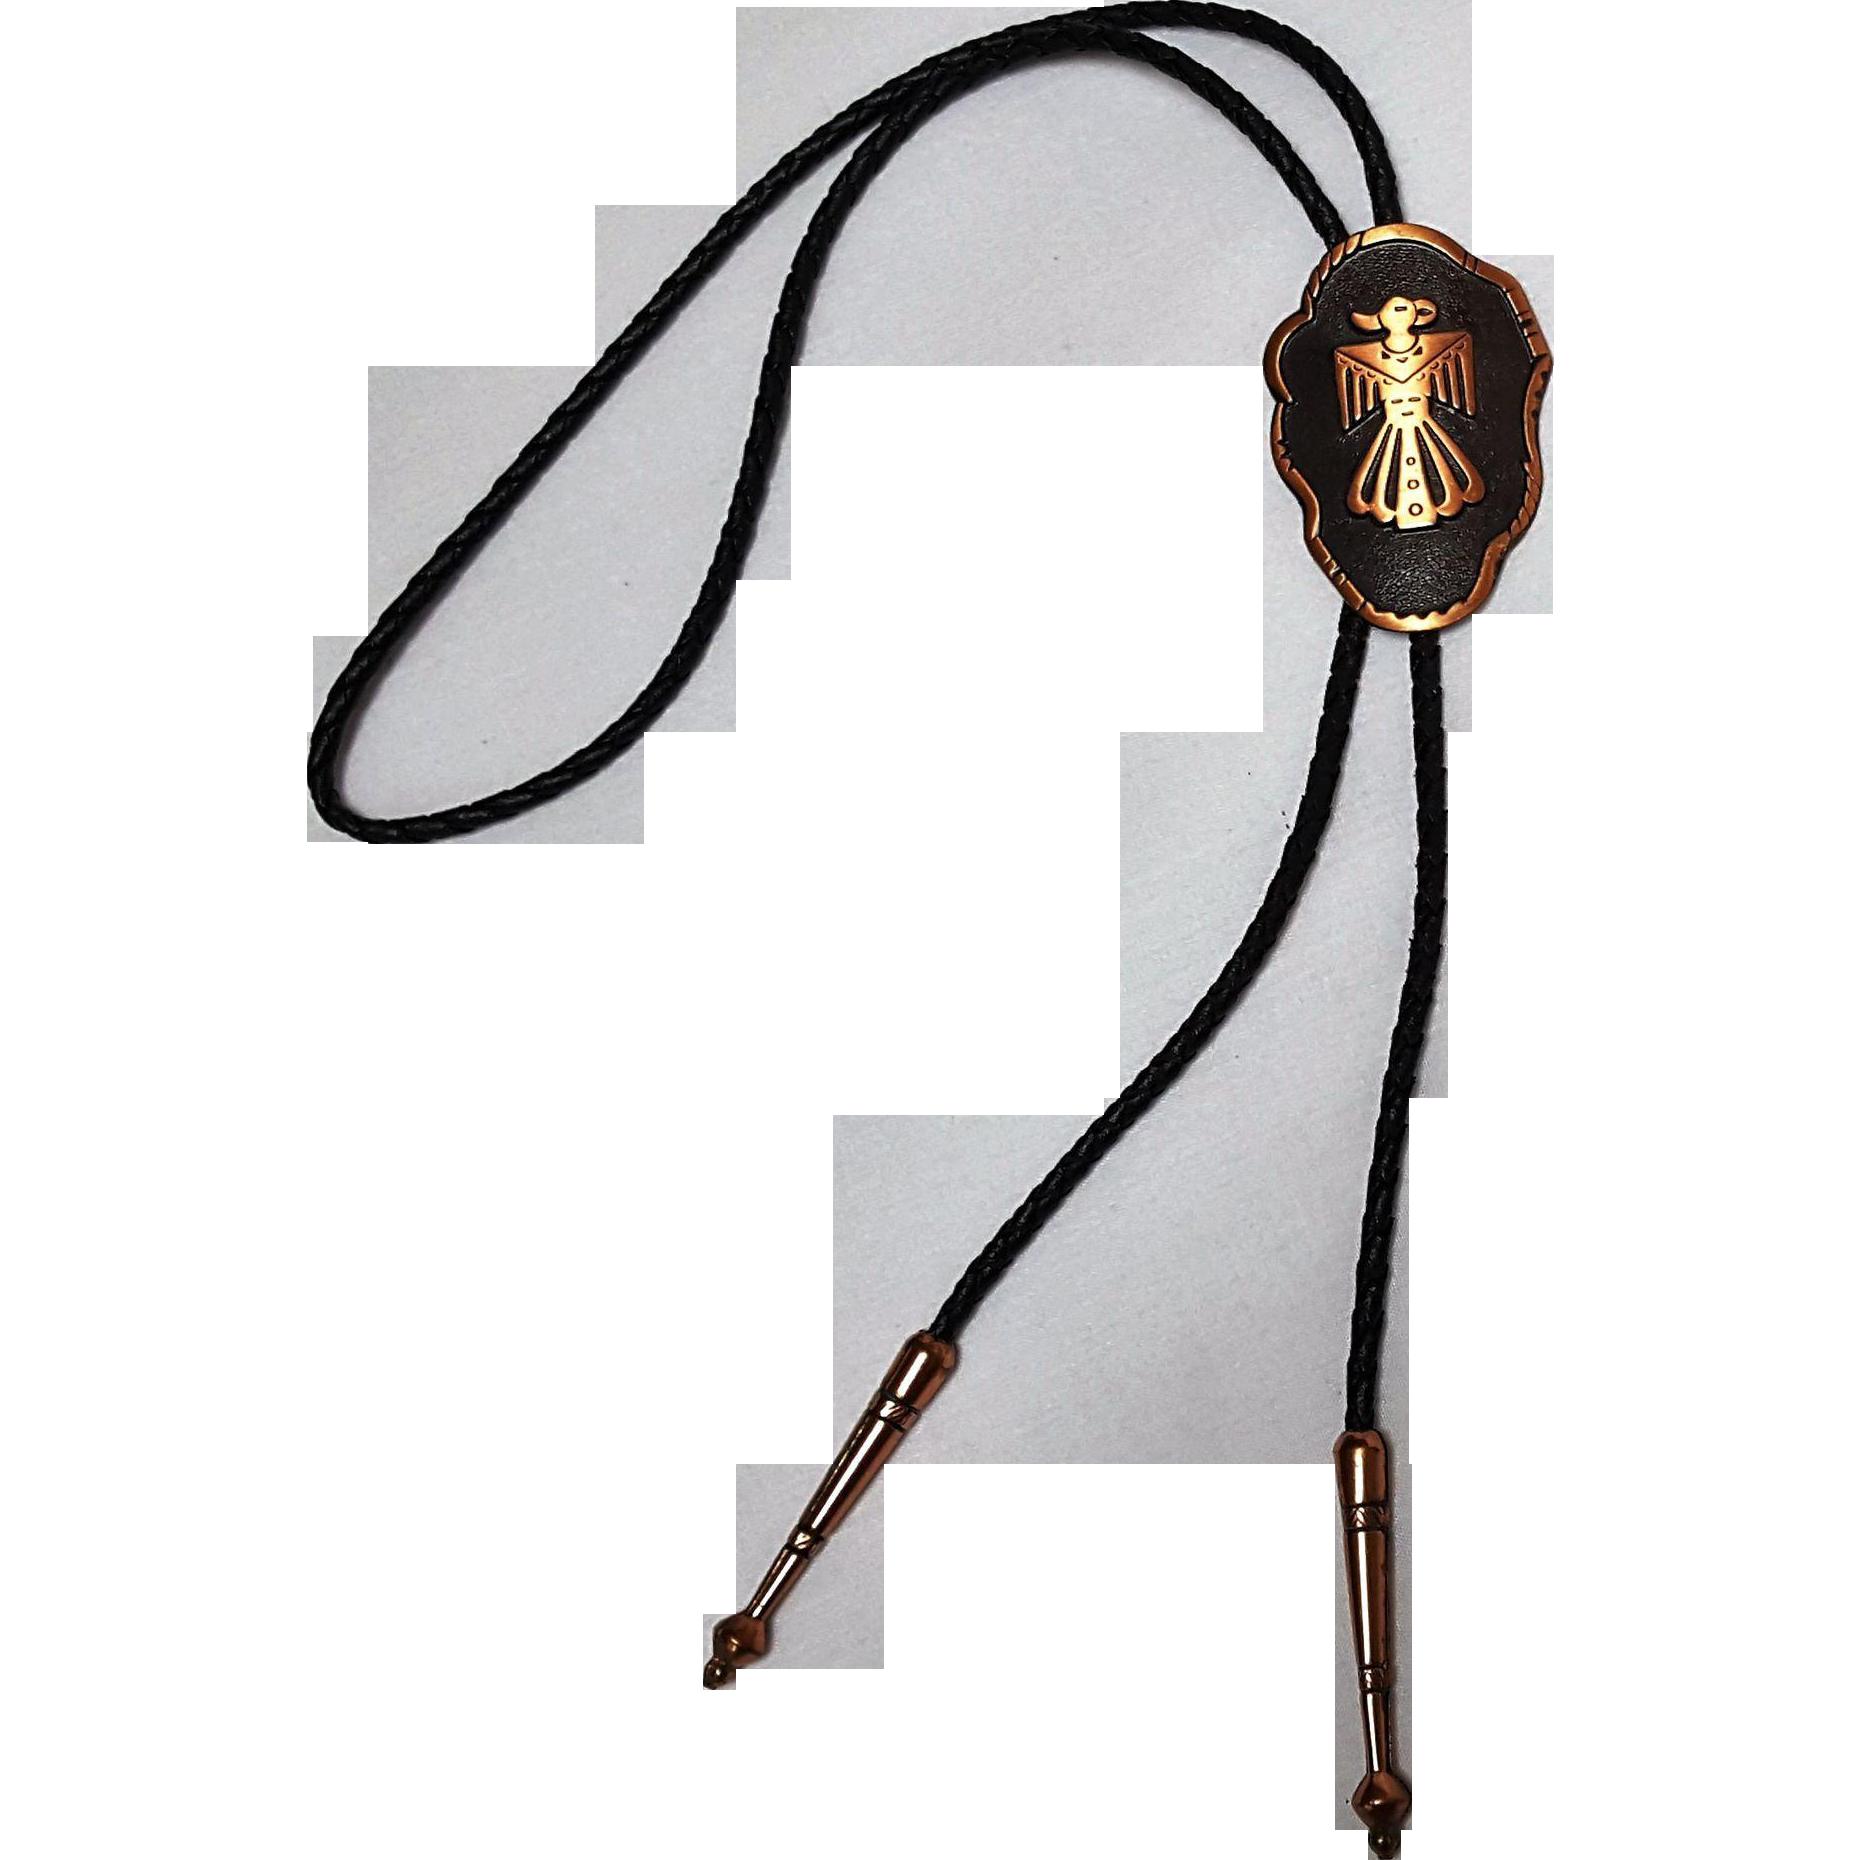 Bell Trading Post copper bolo tie thunderbird